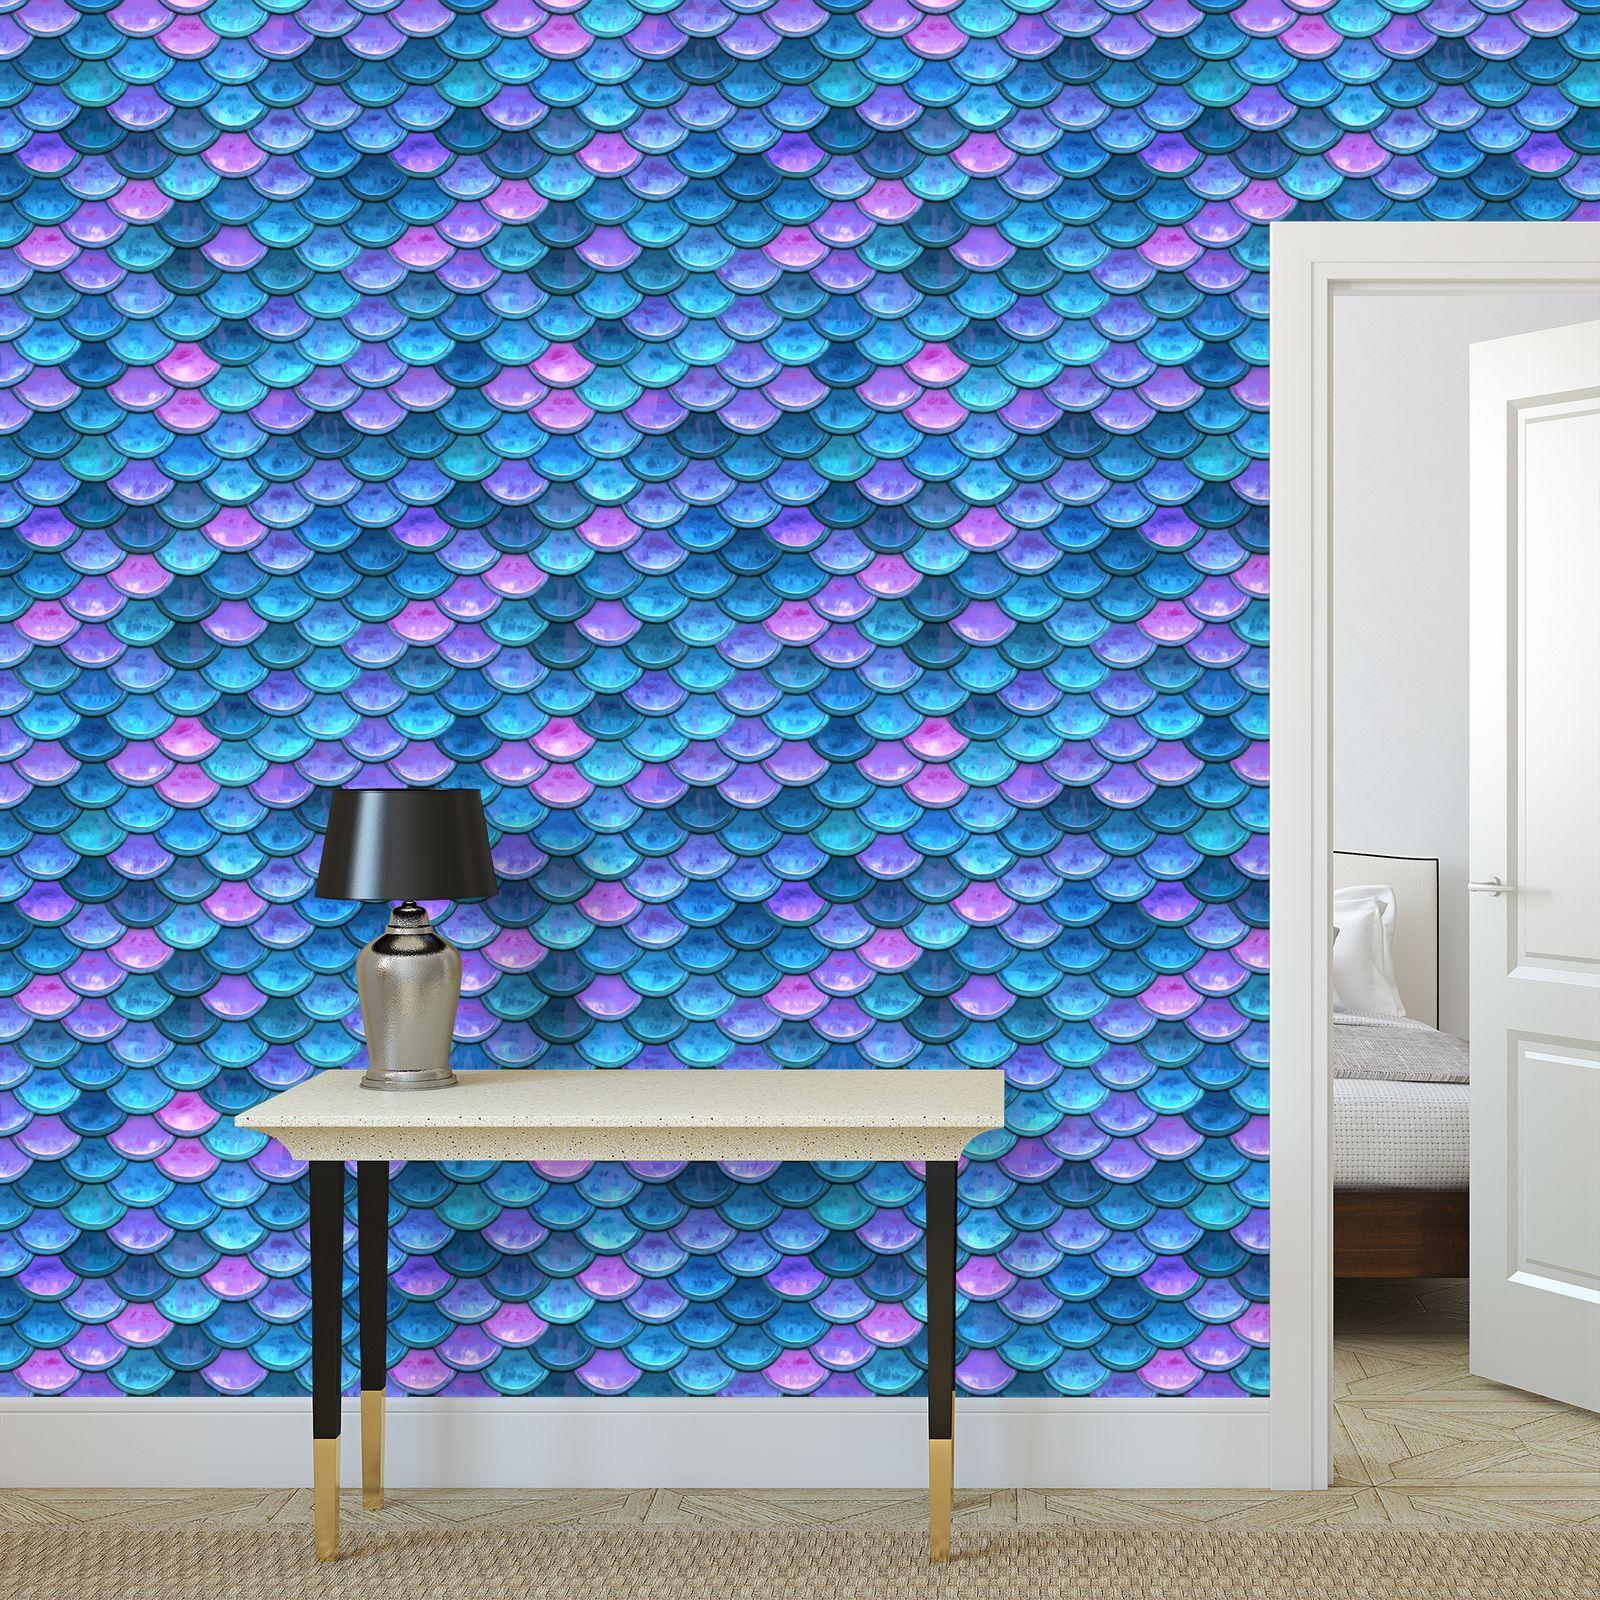 Mermaid skin - Wallpaper Rolls - Fantasy, iridescent bright pink blue scales of dragon, fish tail, mermaid lover gift, sea creature, ocean - Tiana Lofd design